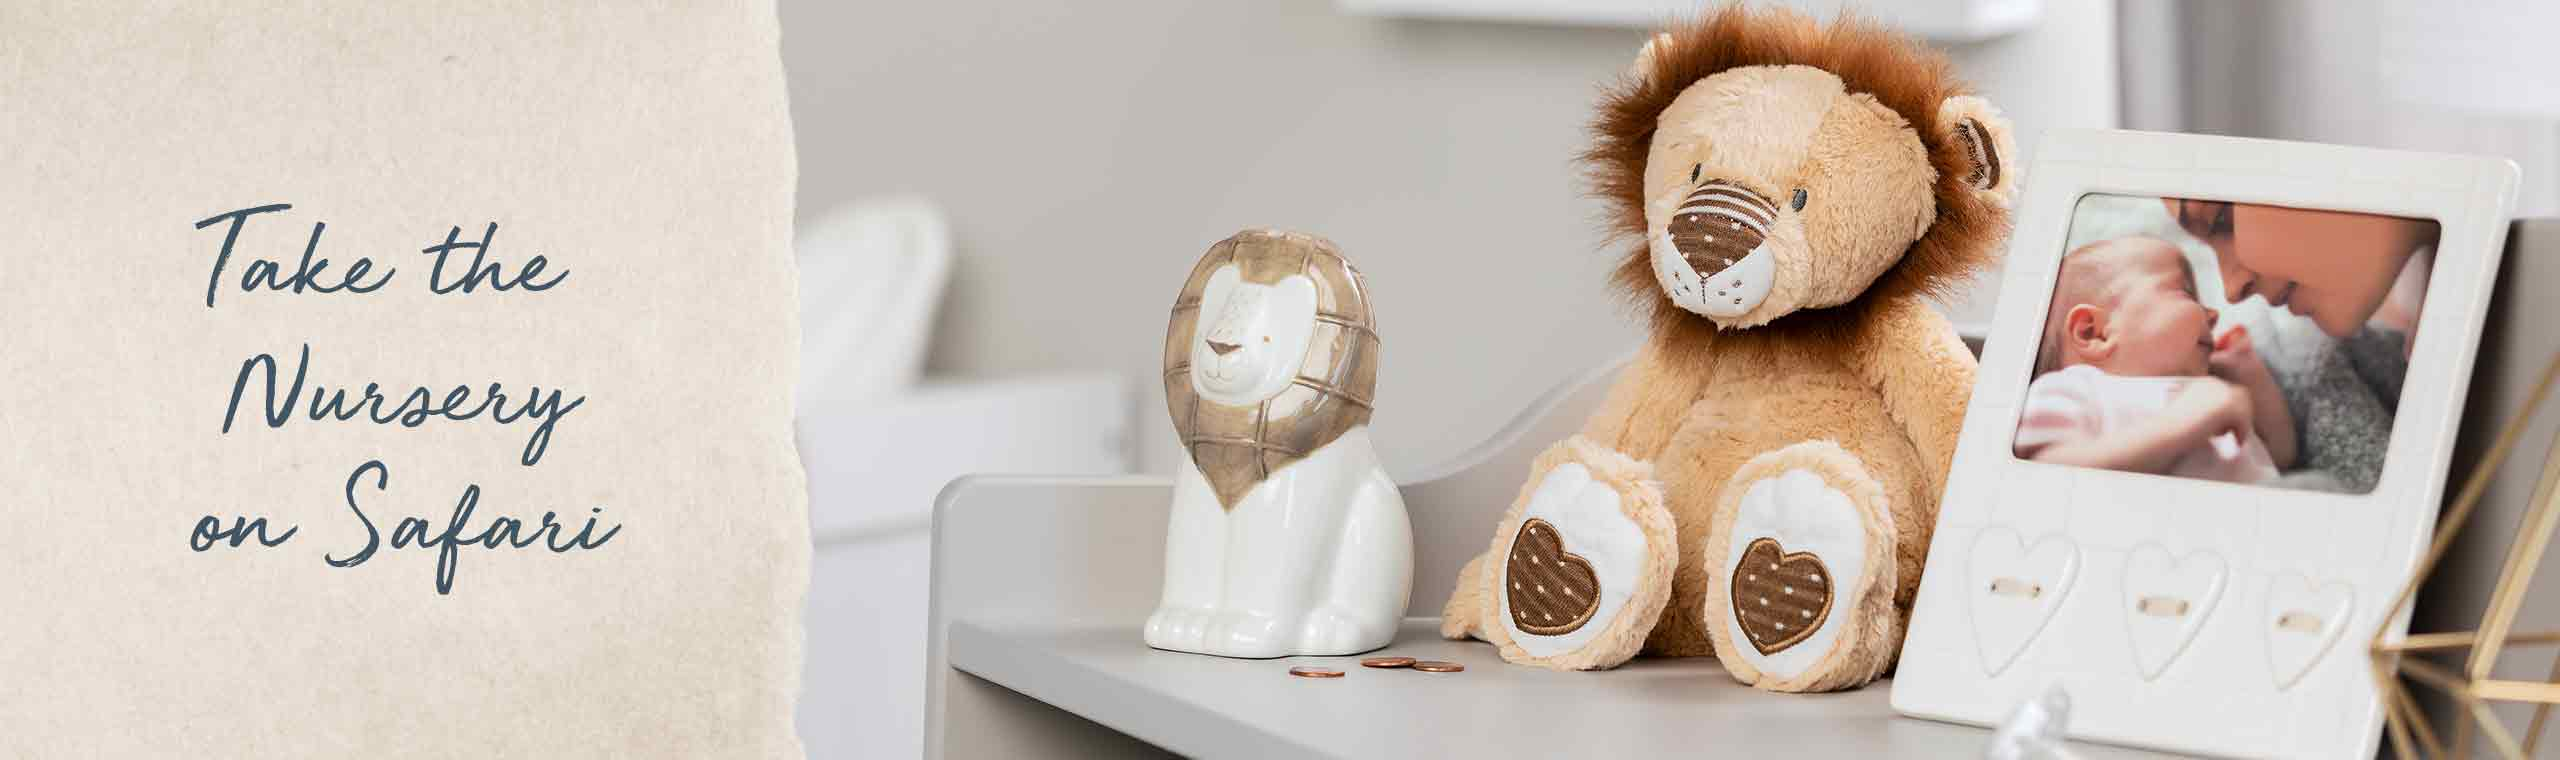 Take the Nursery on a Safari! a Photo of a stuffed lion next to a baby frame